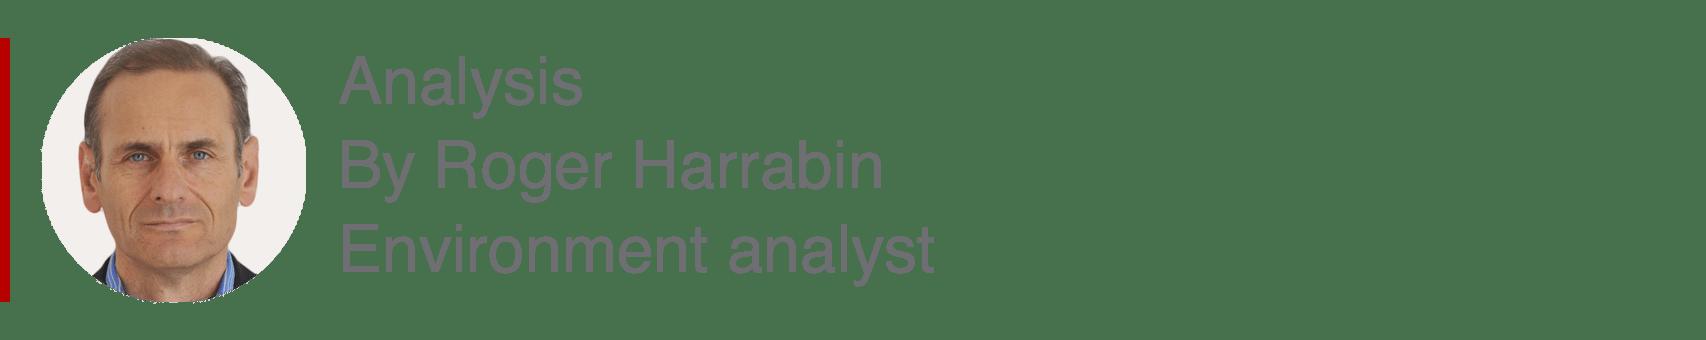 Analysis box by Roger Harrabin, Environment analyst